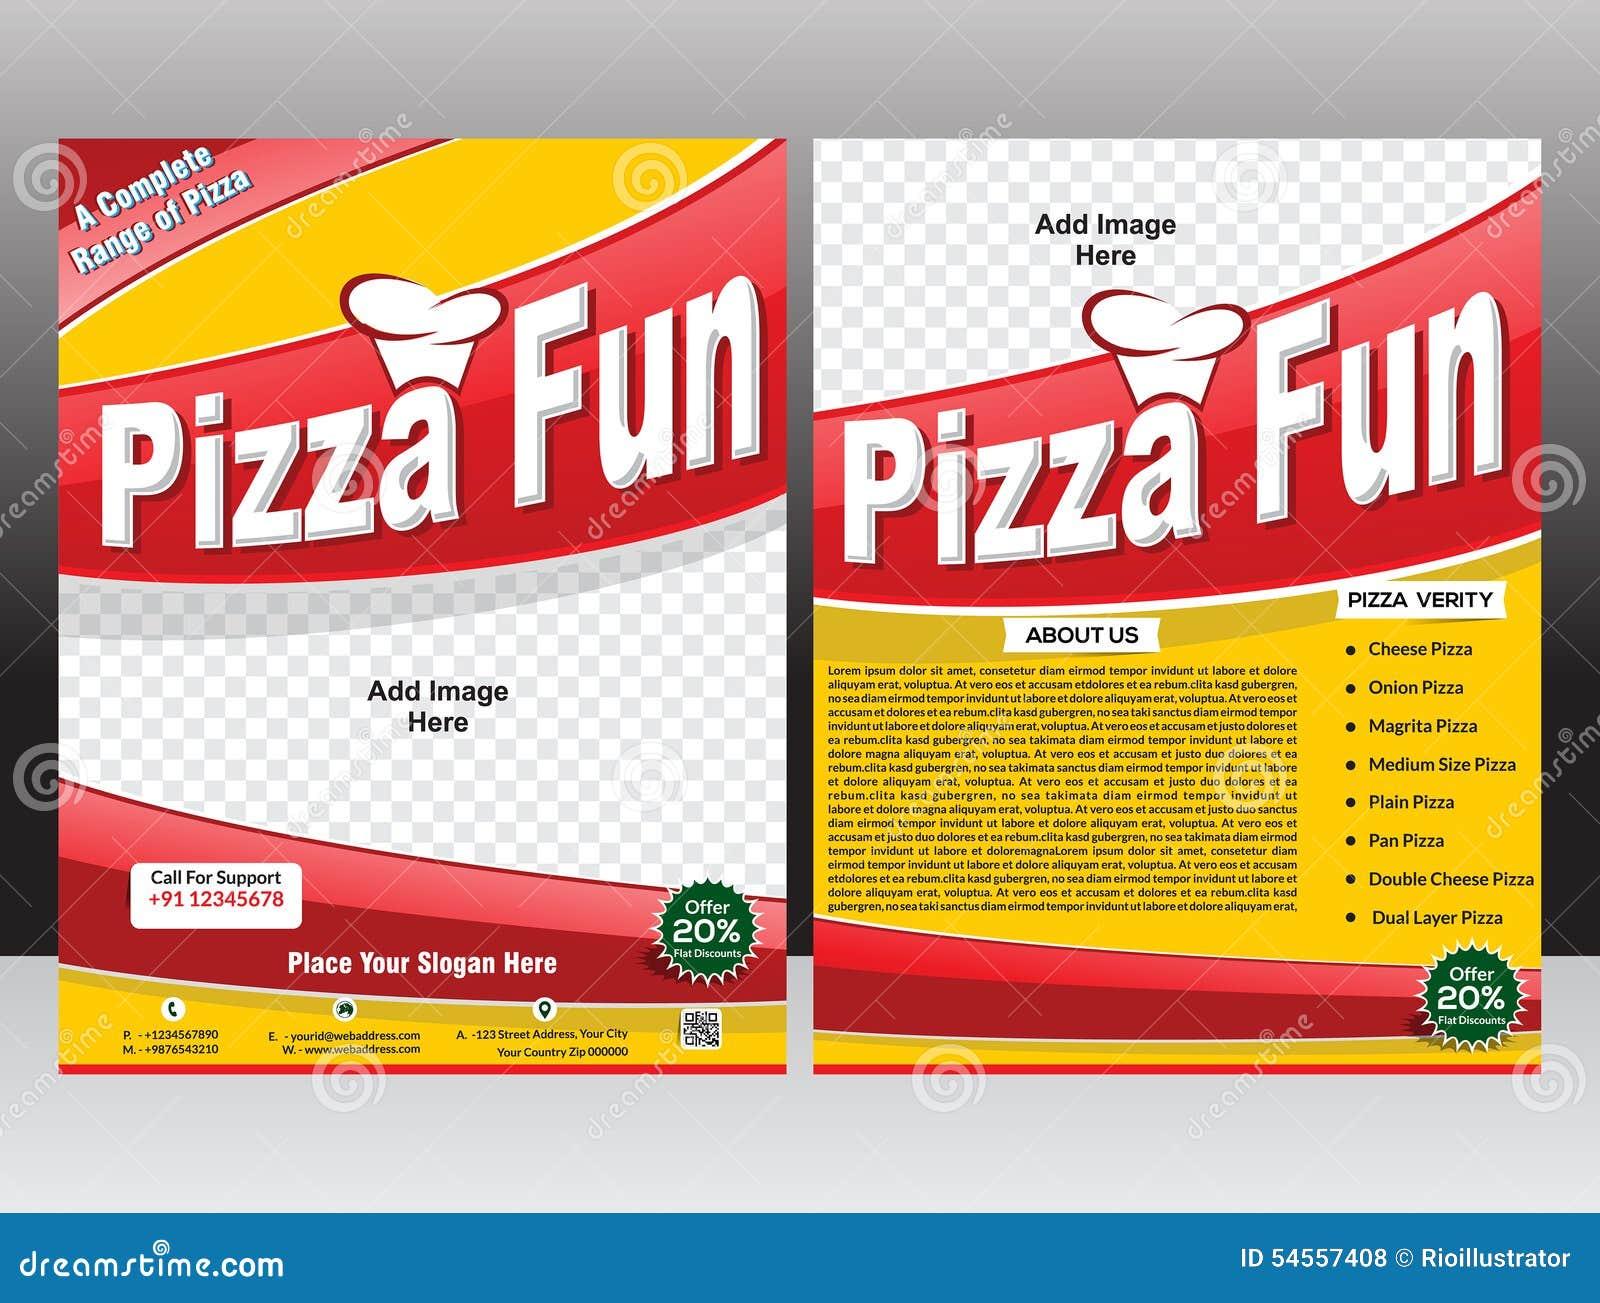 Pizza Fun Flyer & Magazine Design Stock Vector - Image: 54557408